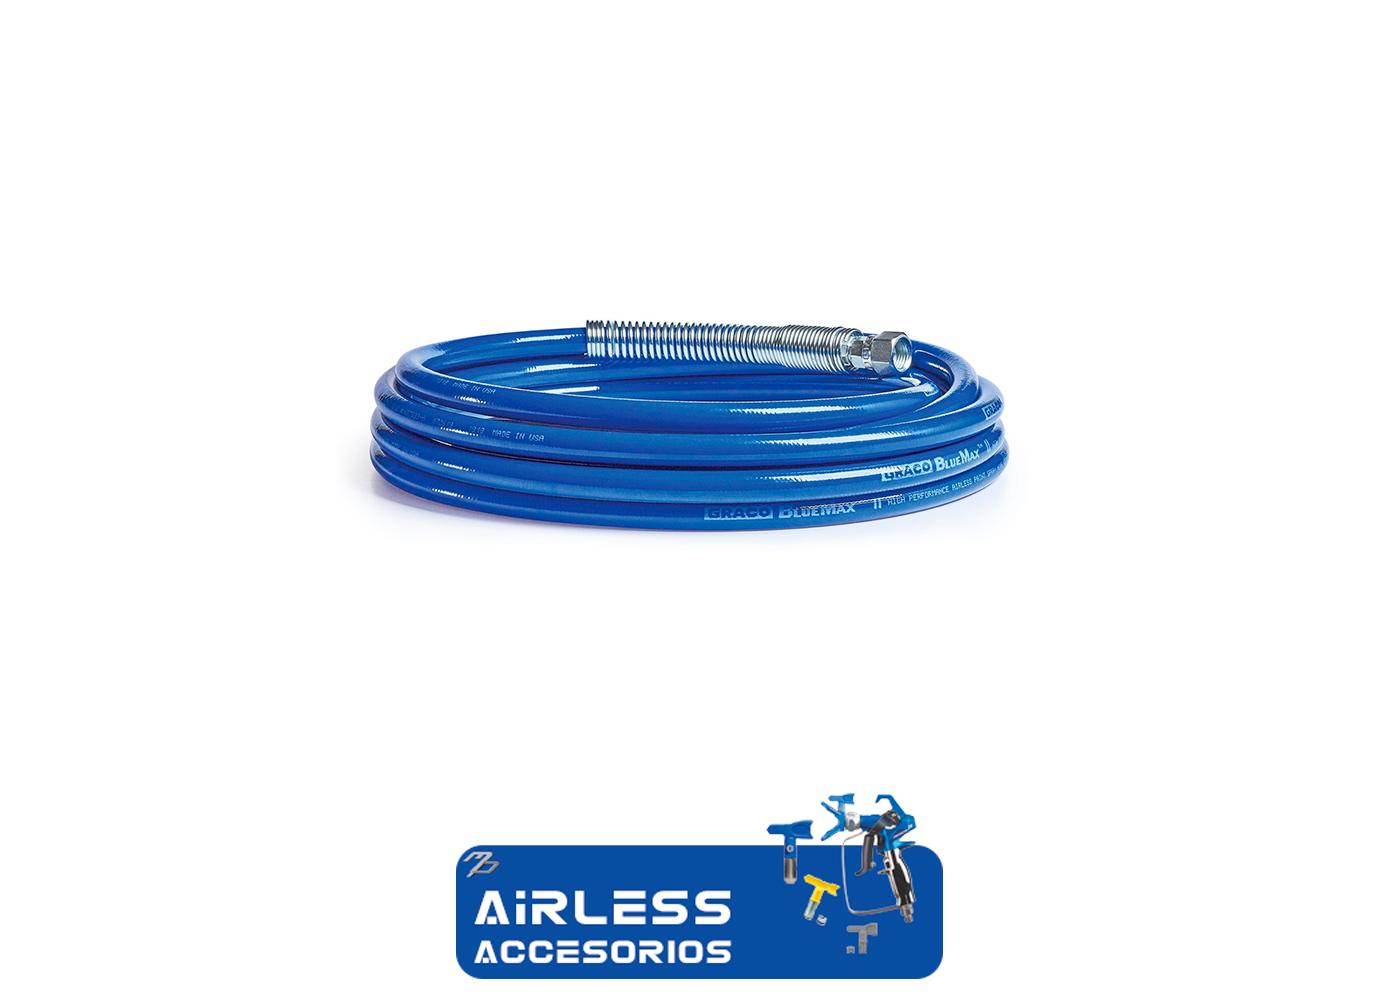 accesorios airless manguera 223756 mexipol